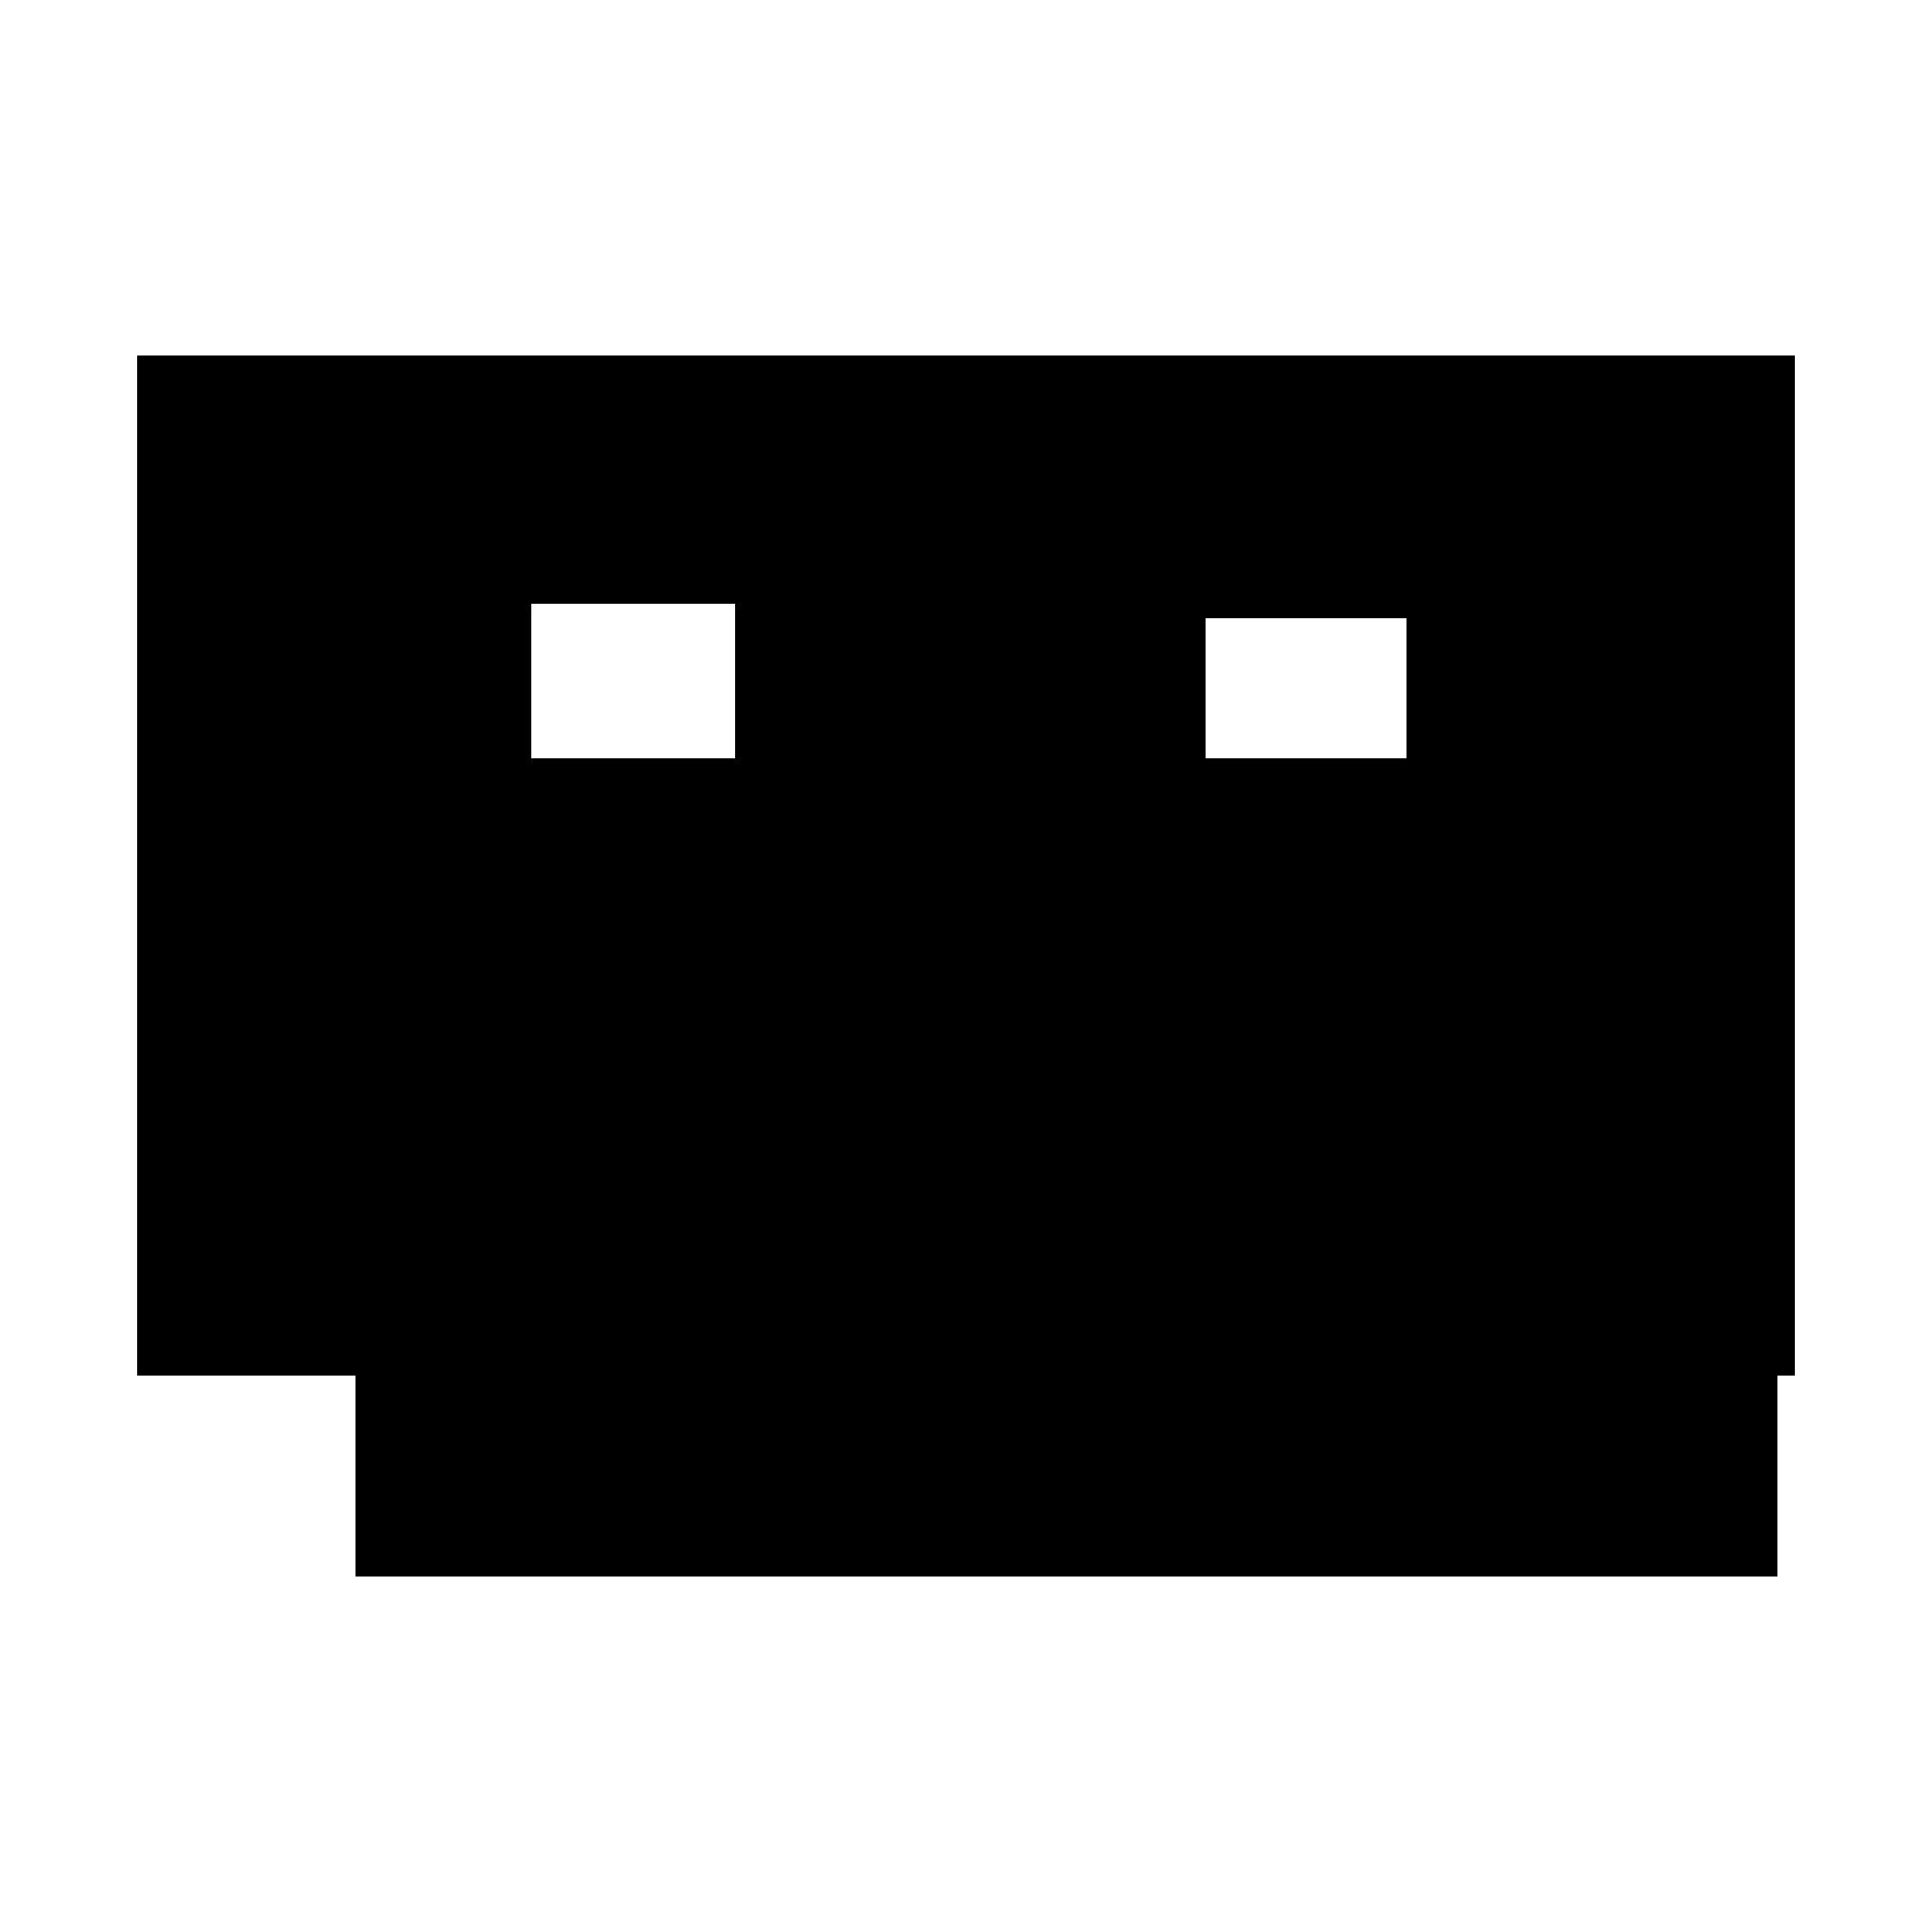 RyanClairMusic-nocross